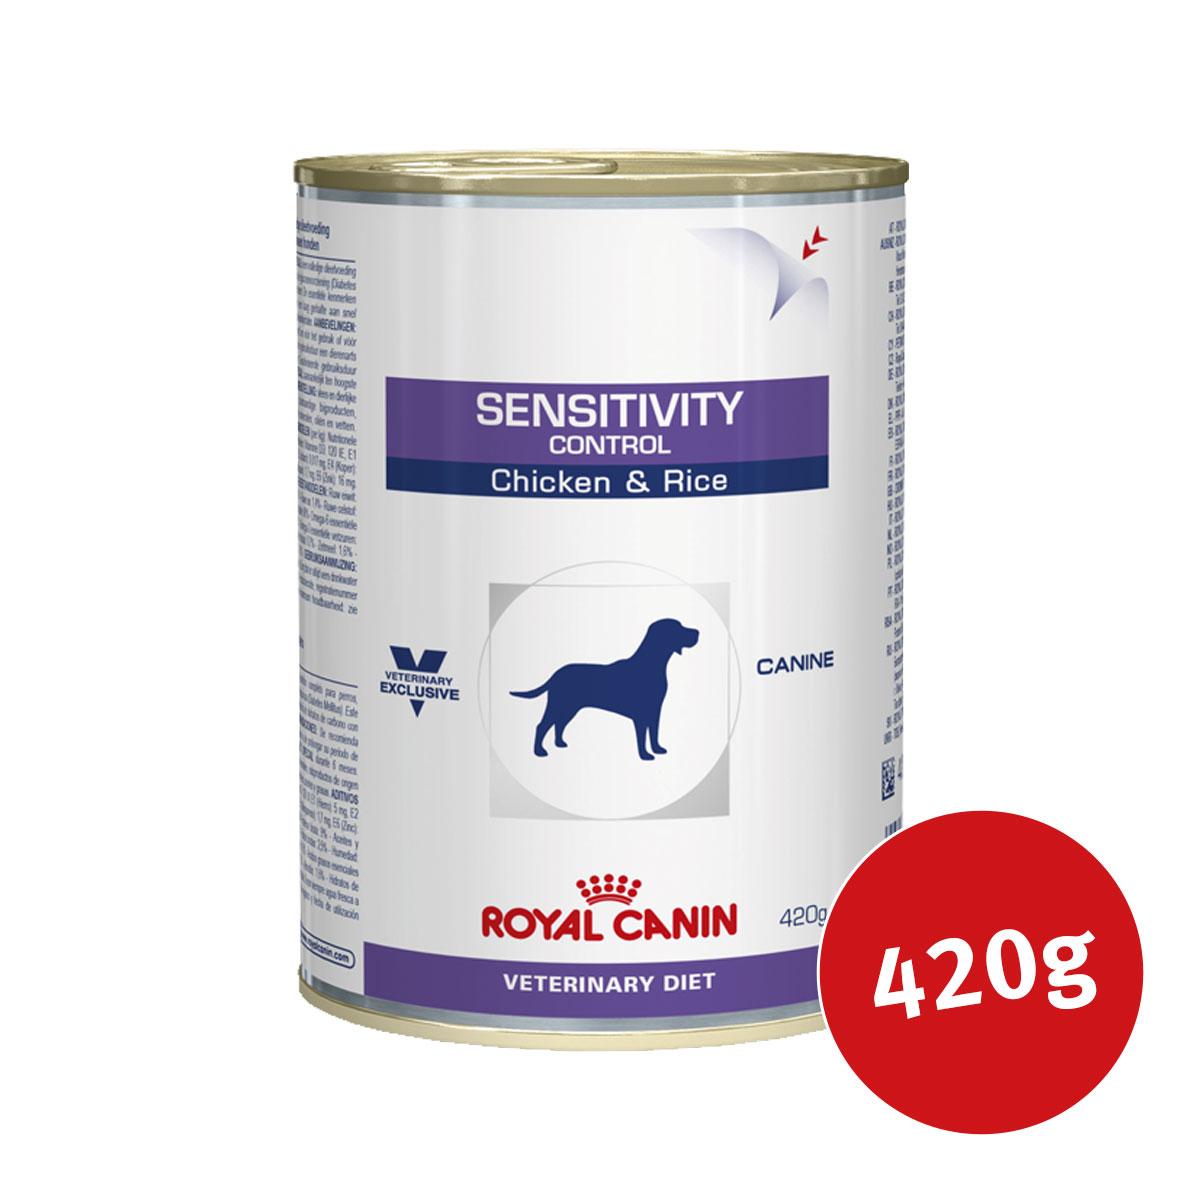 royal canin vet diet nassfutter sensitivity control chicken. Black Bedroom Furniture Sets. Home Design Ideas